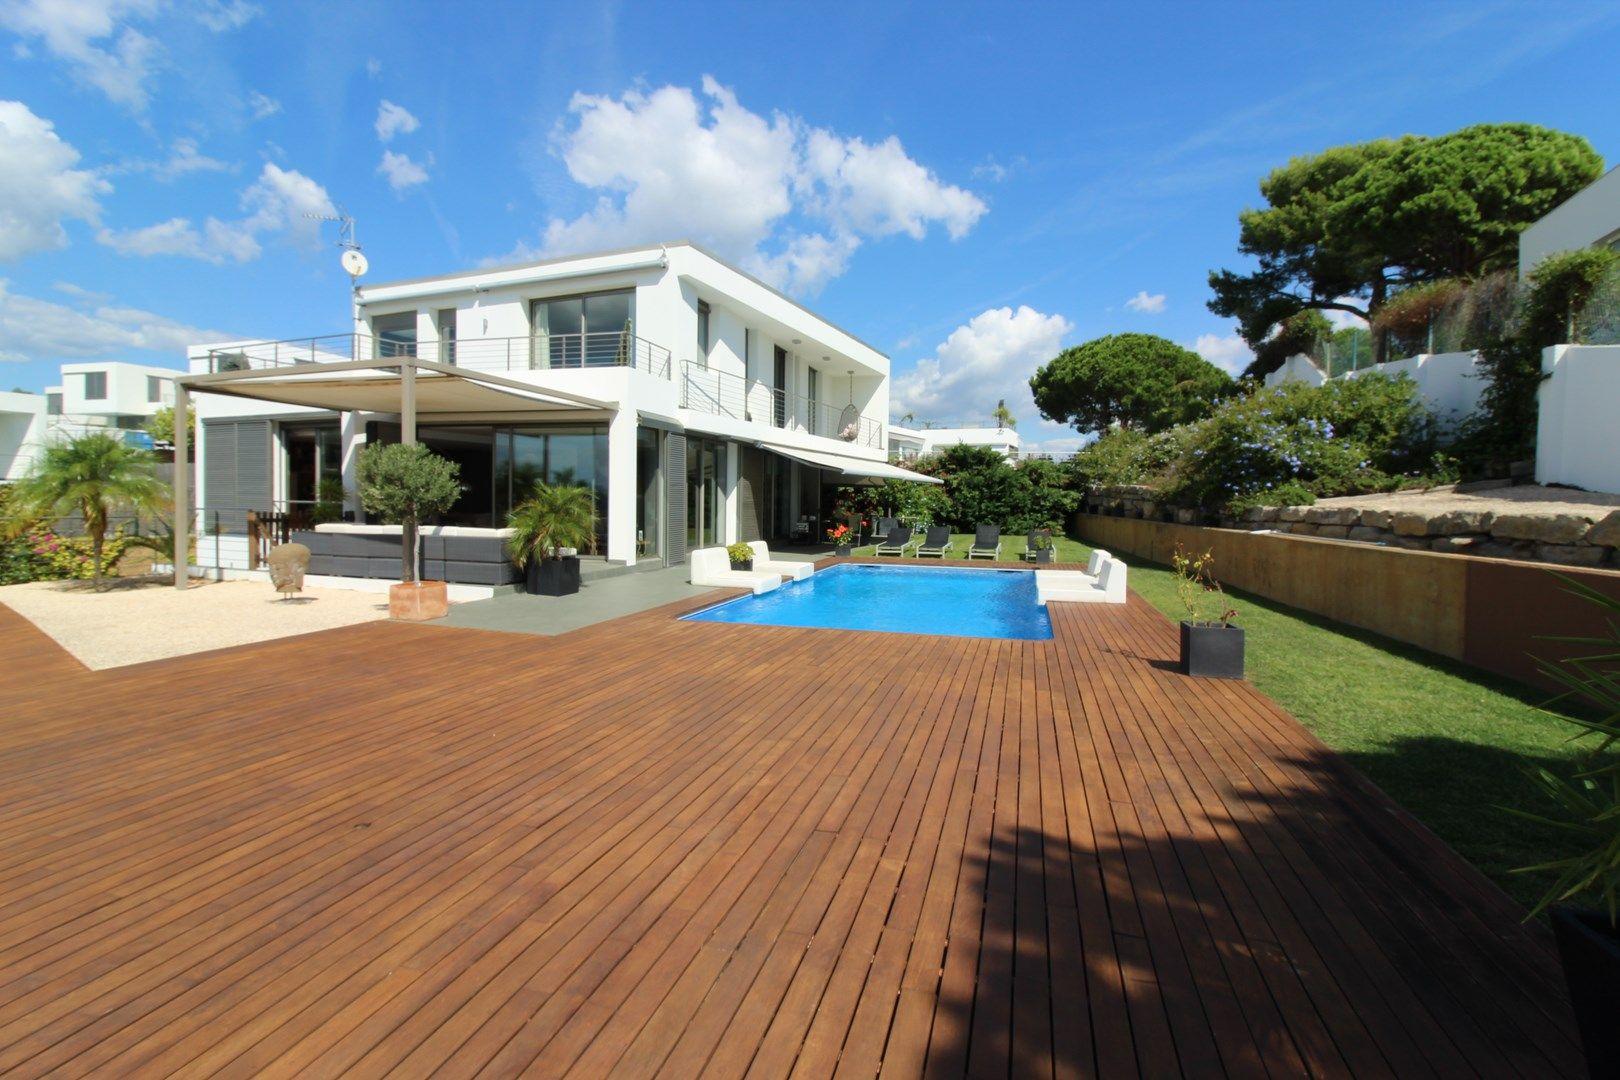 Casa / Chalet en Arenys de Mar, PORTINYOL, venta